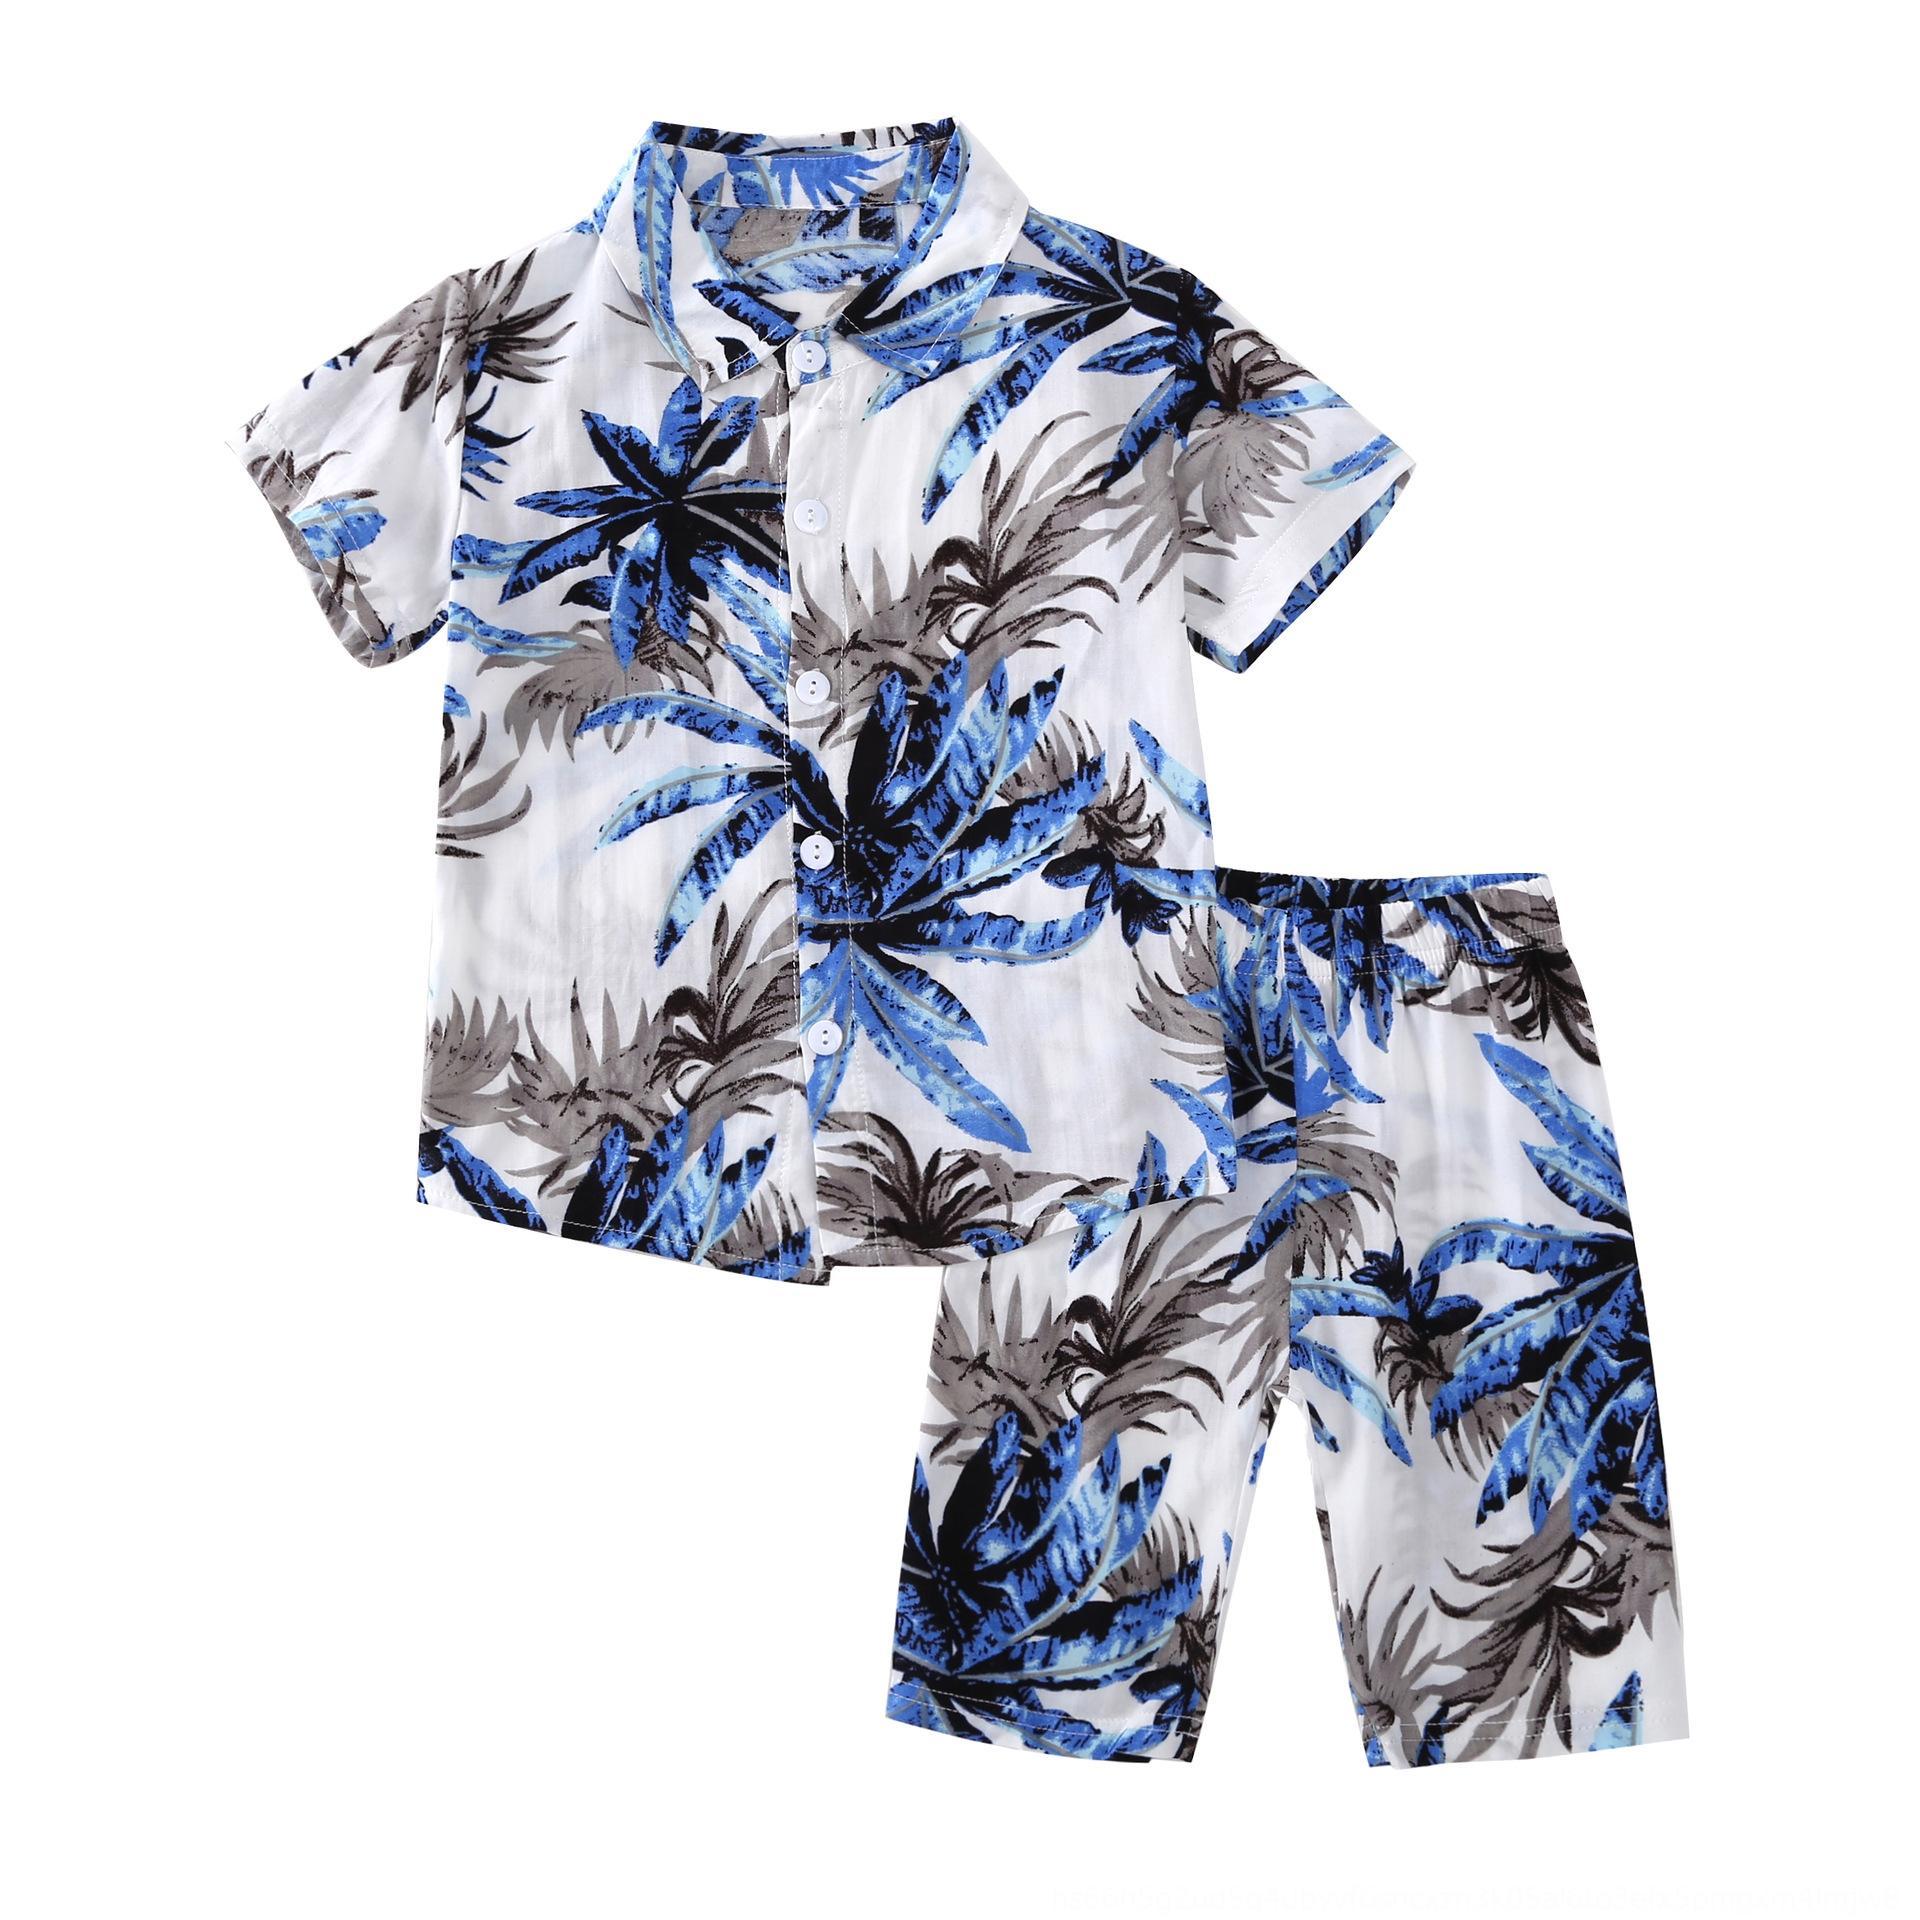 Hot-Verkauf Hemd Kinder kurze Hose keucht Kinderanzug 2020 Sommer neue Kurzarm-Shirt + Kurzschlussklage